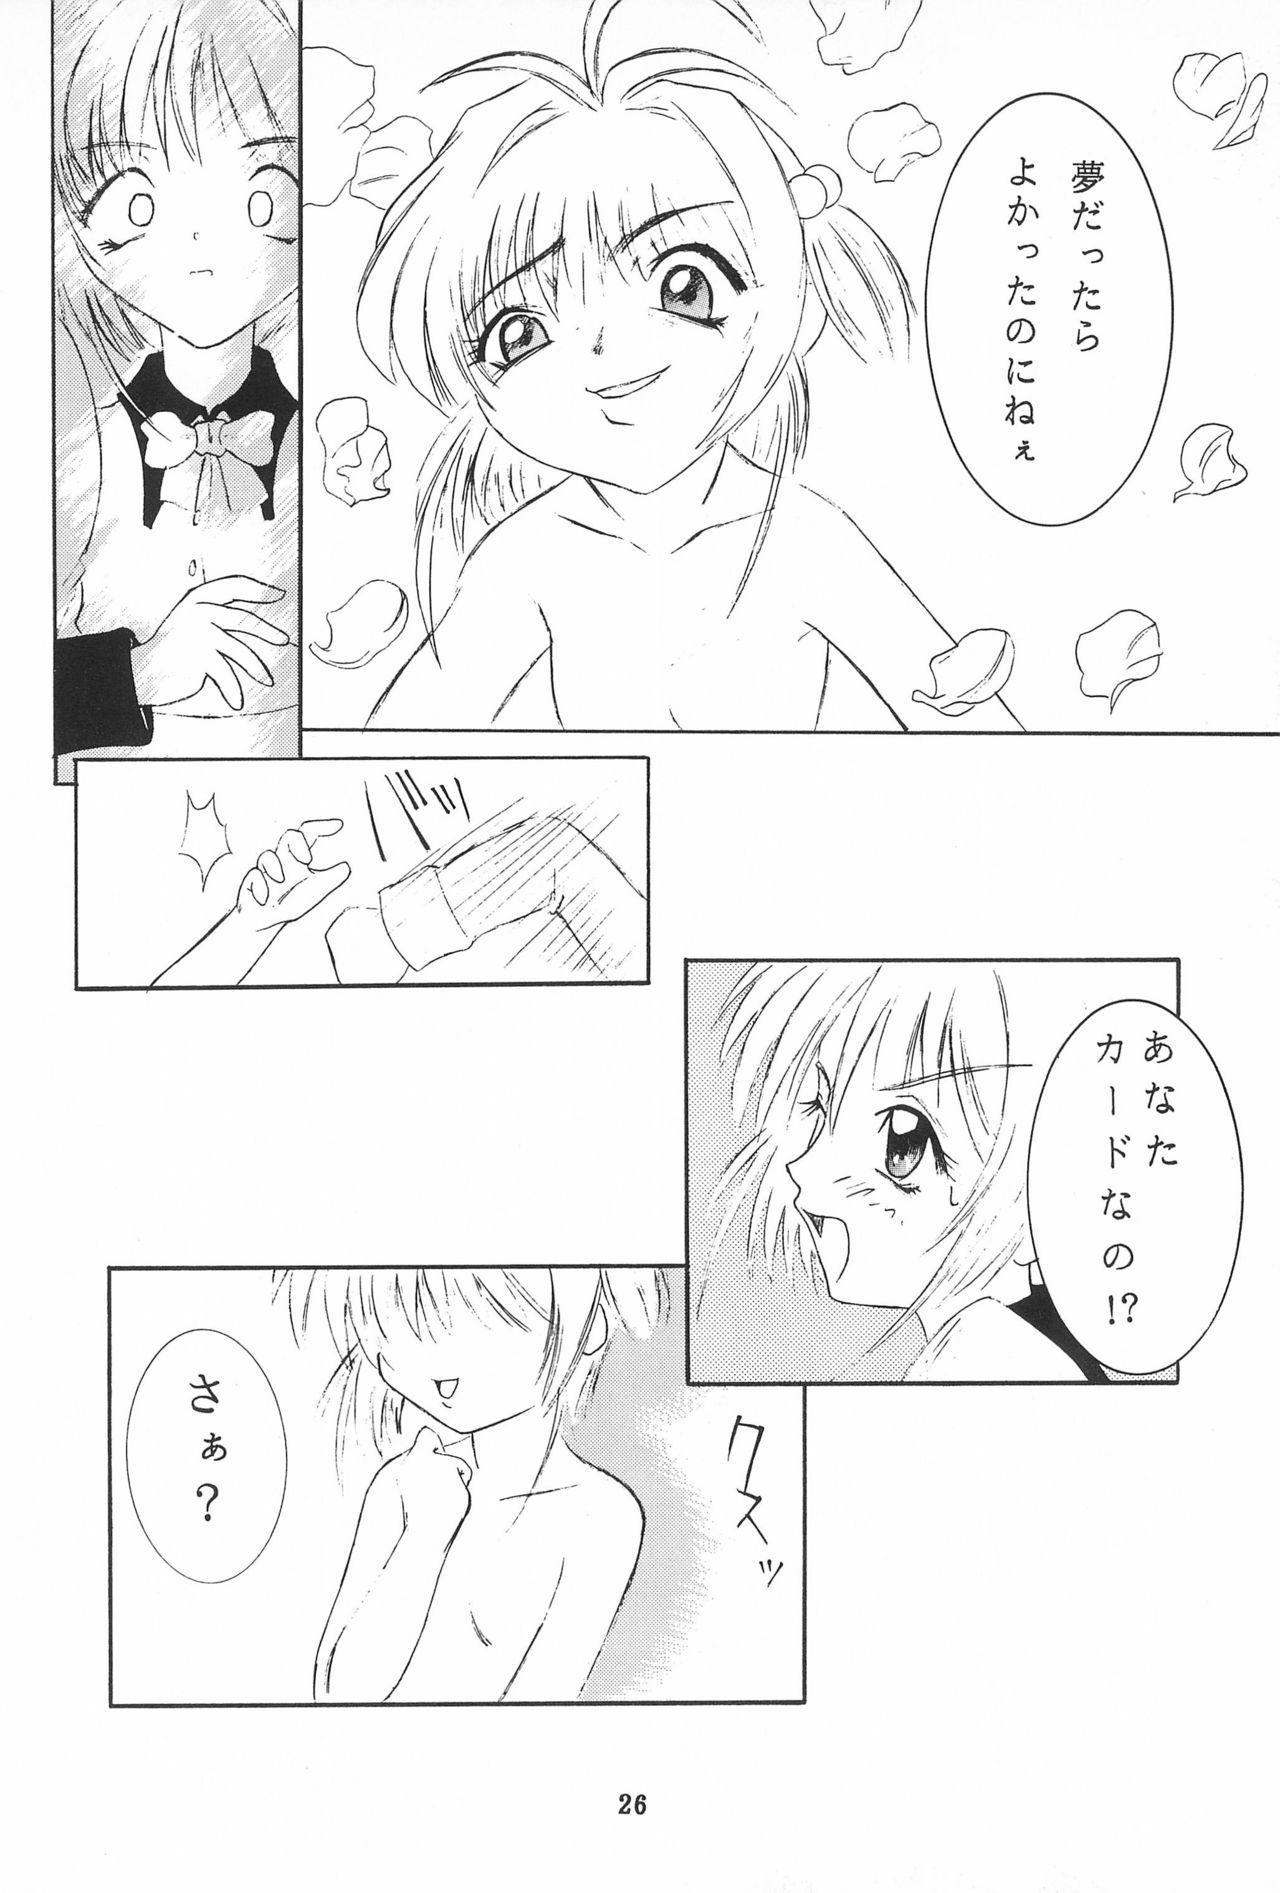 Magokoro o Kimi ni 25